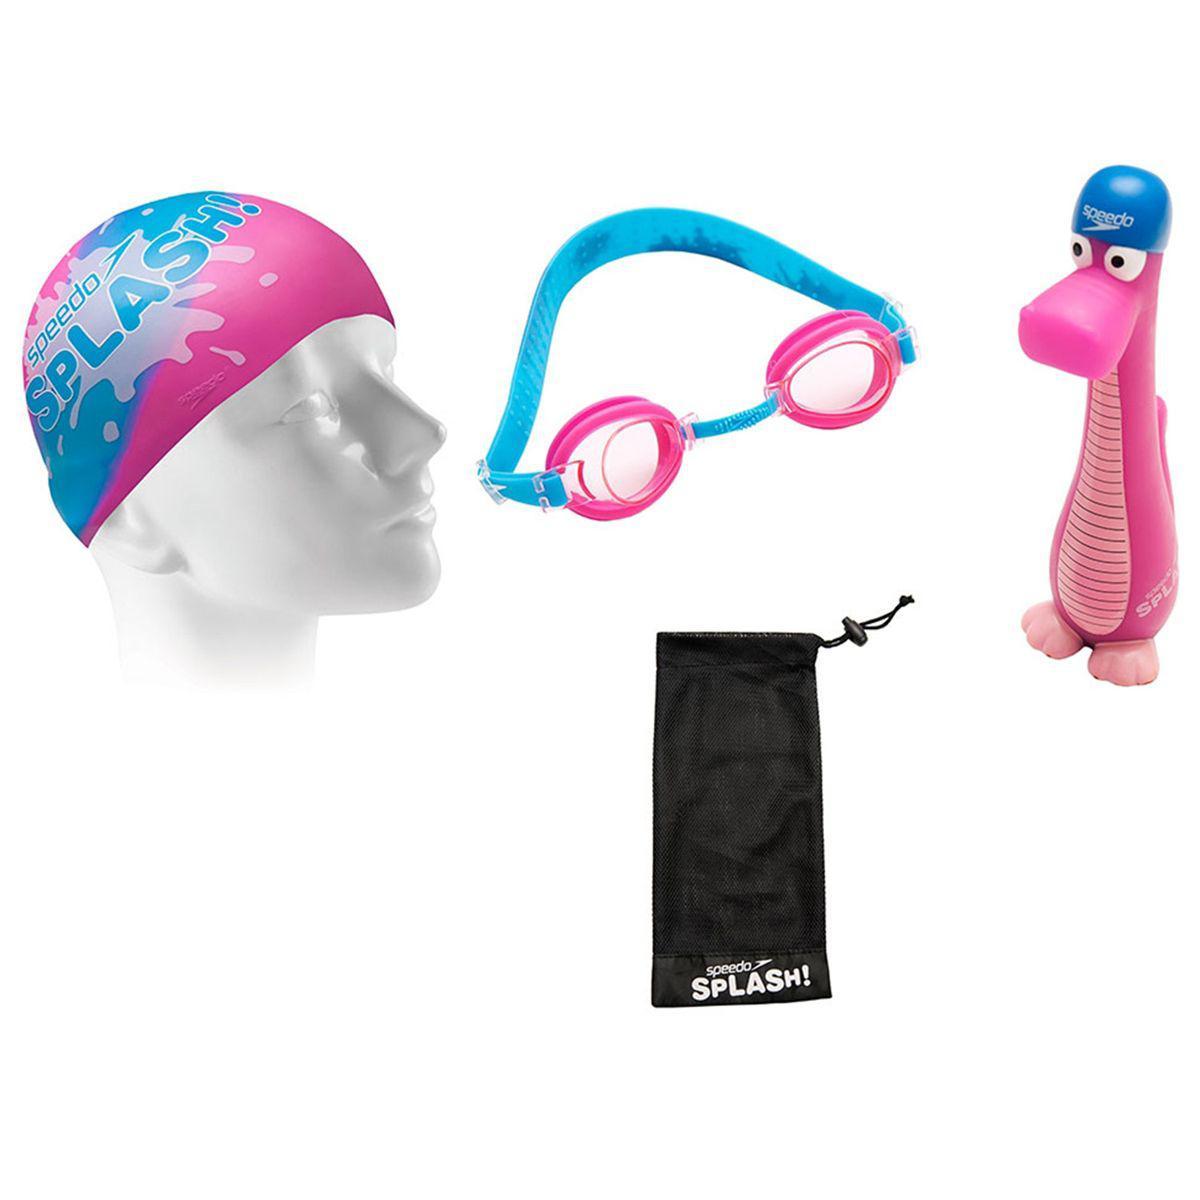 3885798c8 Kit Para Natação Splash Infantil Rosa U Speedo R$ 49,90 à vista. Adicionar  à sacola